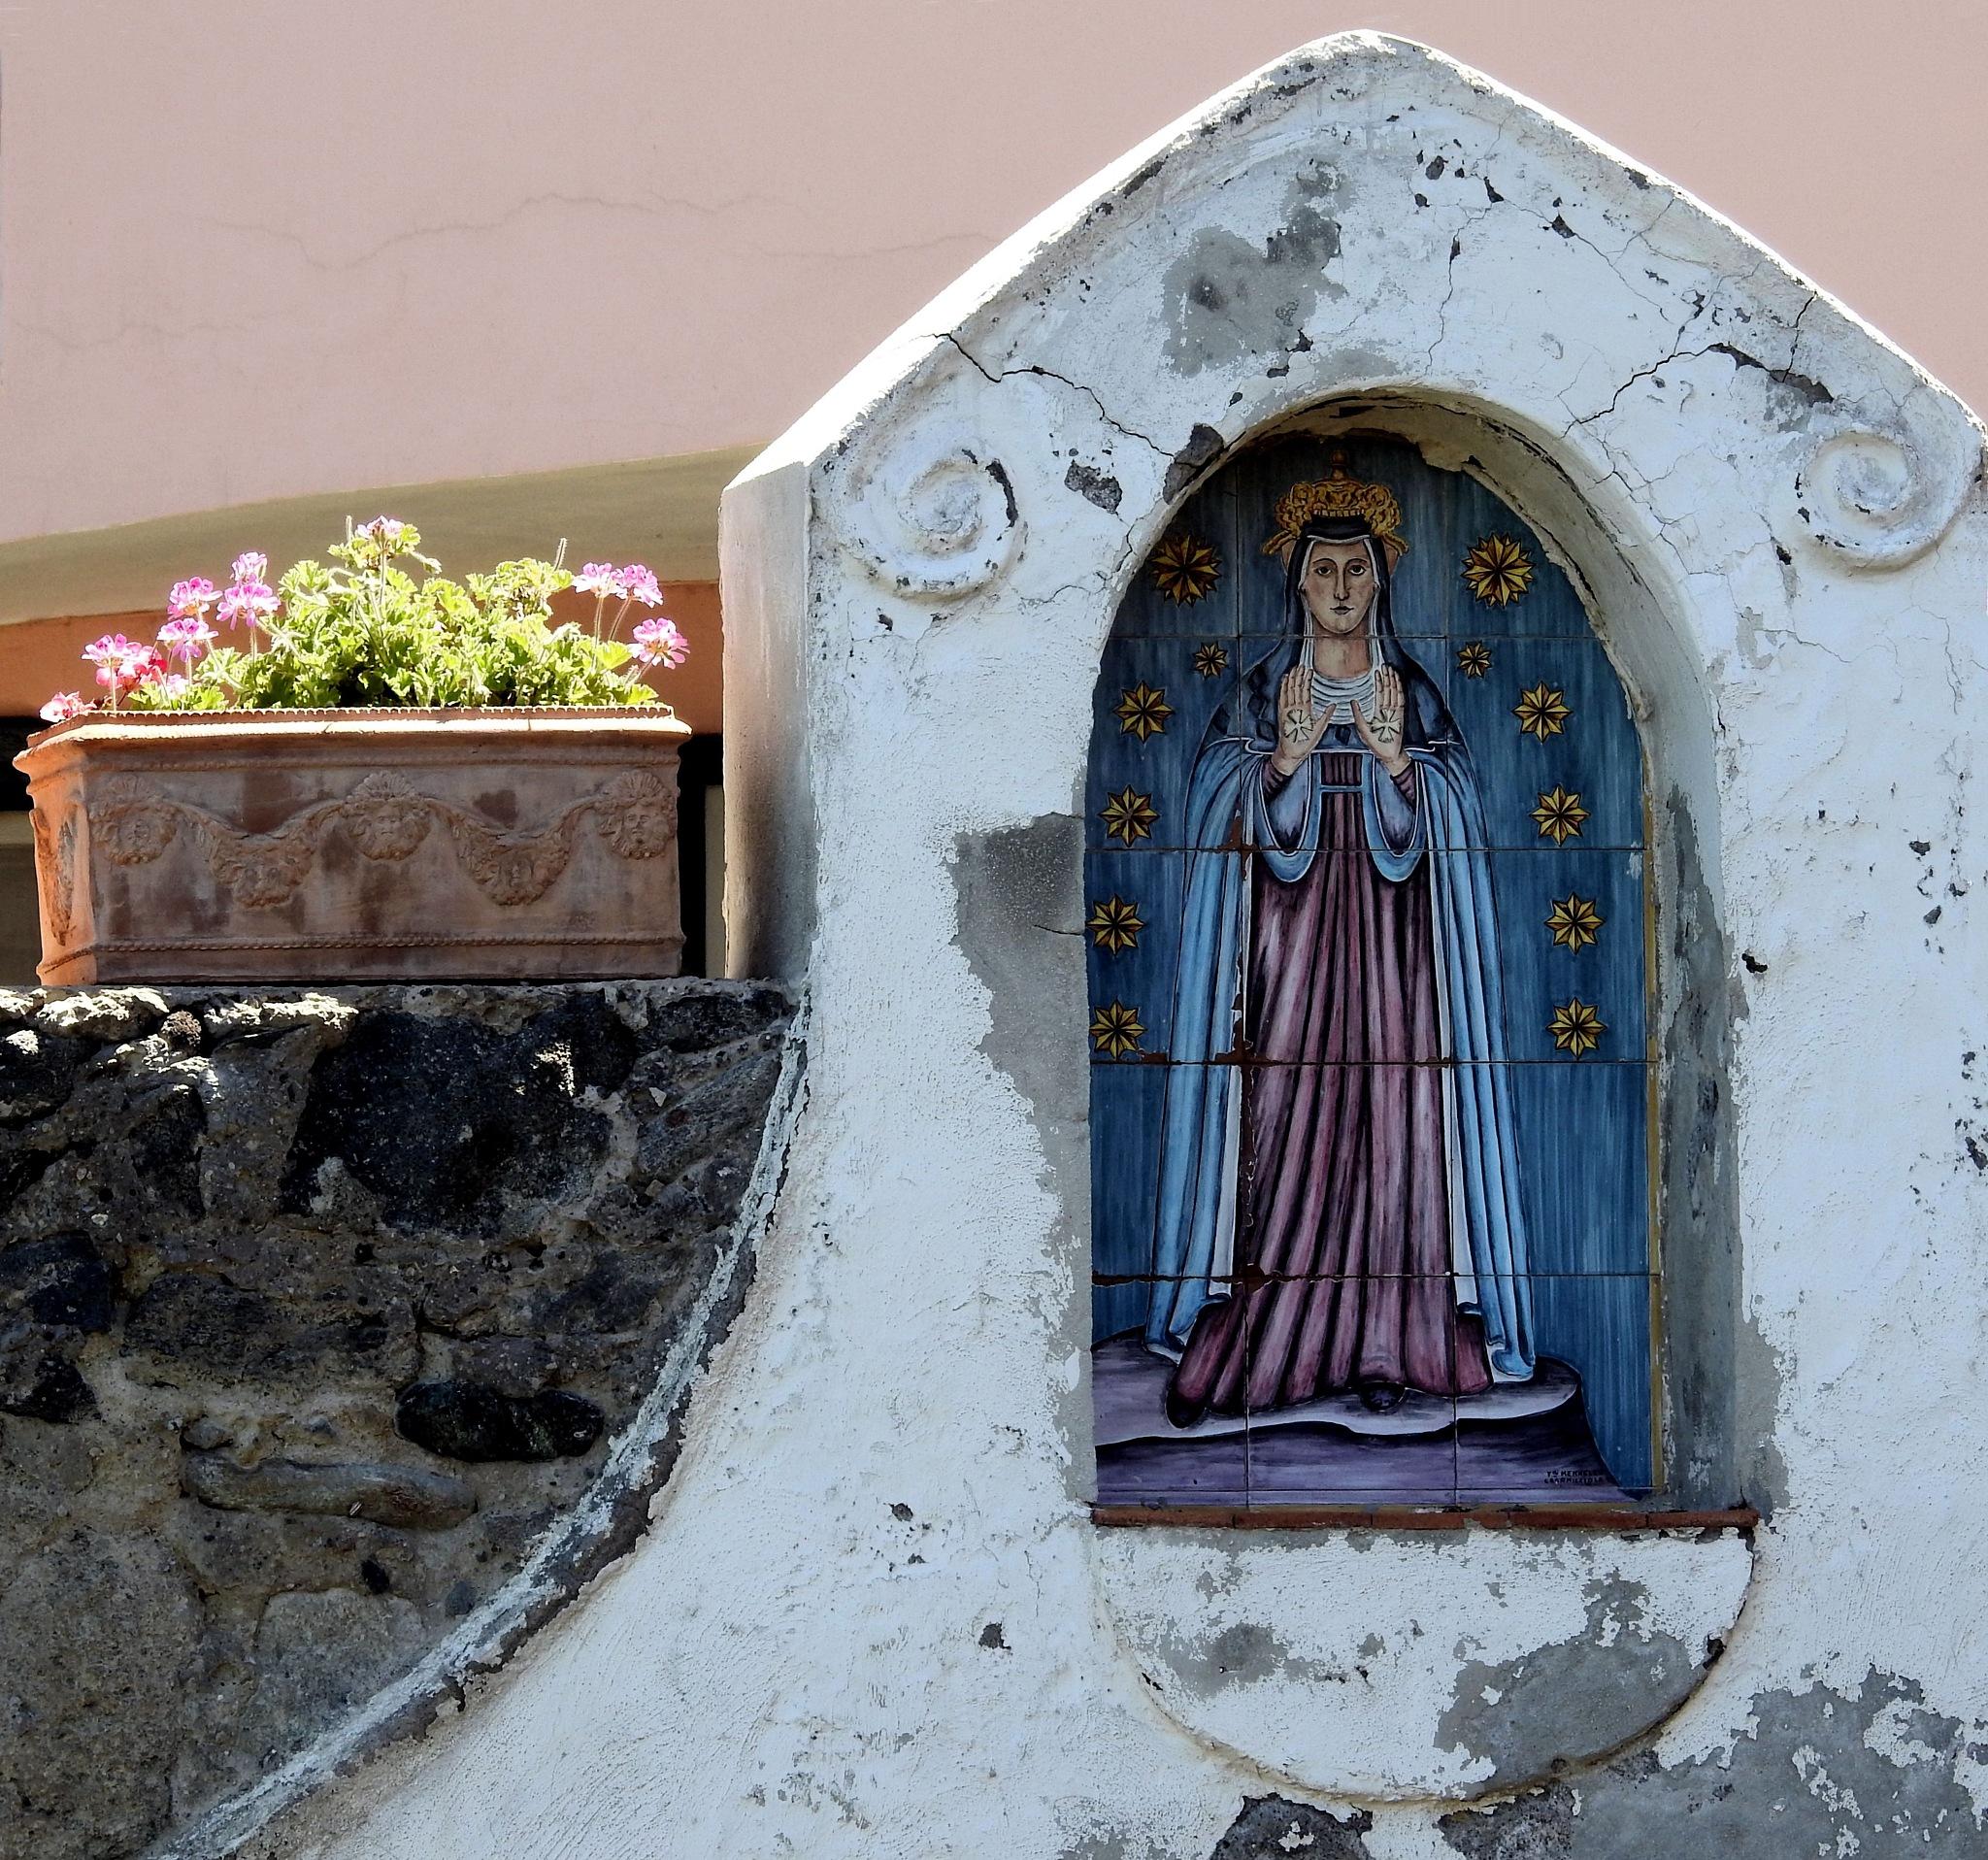 Island Of Ischia [Campania - Italy - Naples] - Madonna And The Flowers by Arnaldo De Lisio